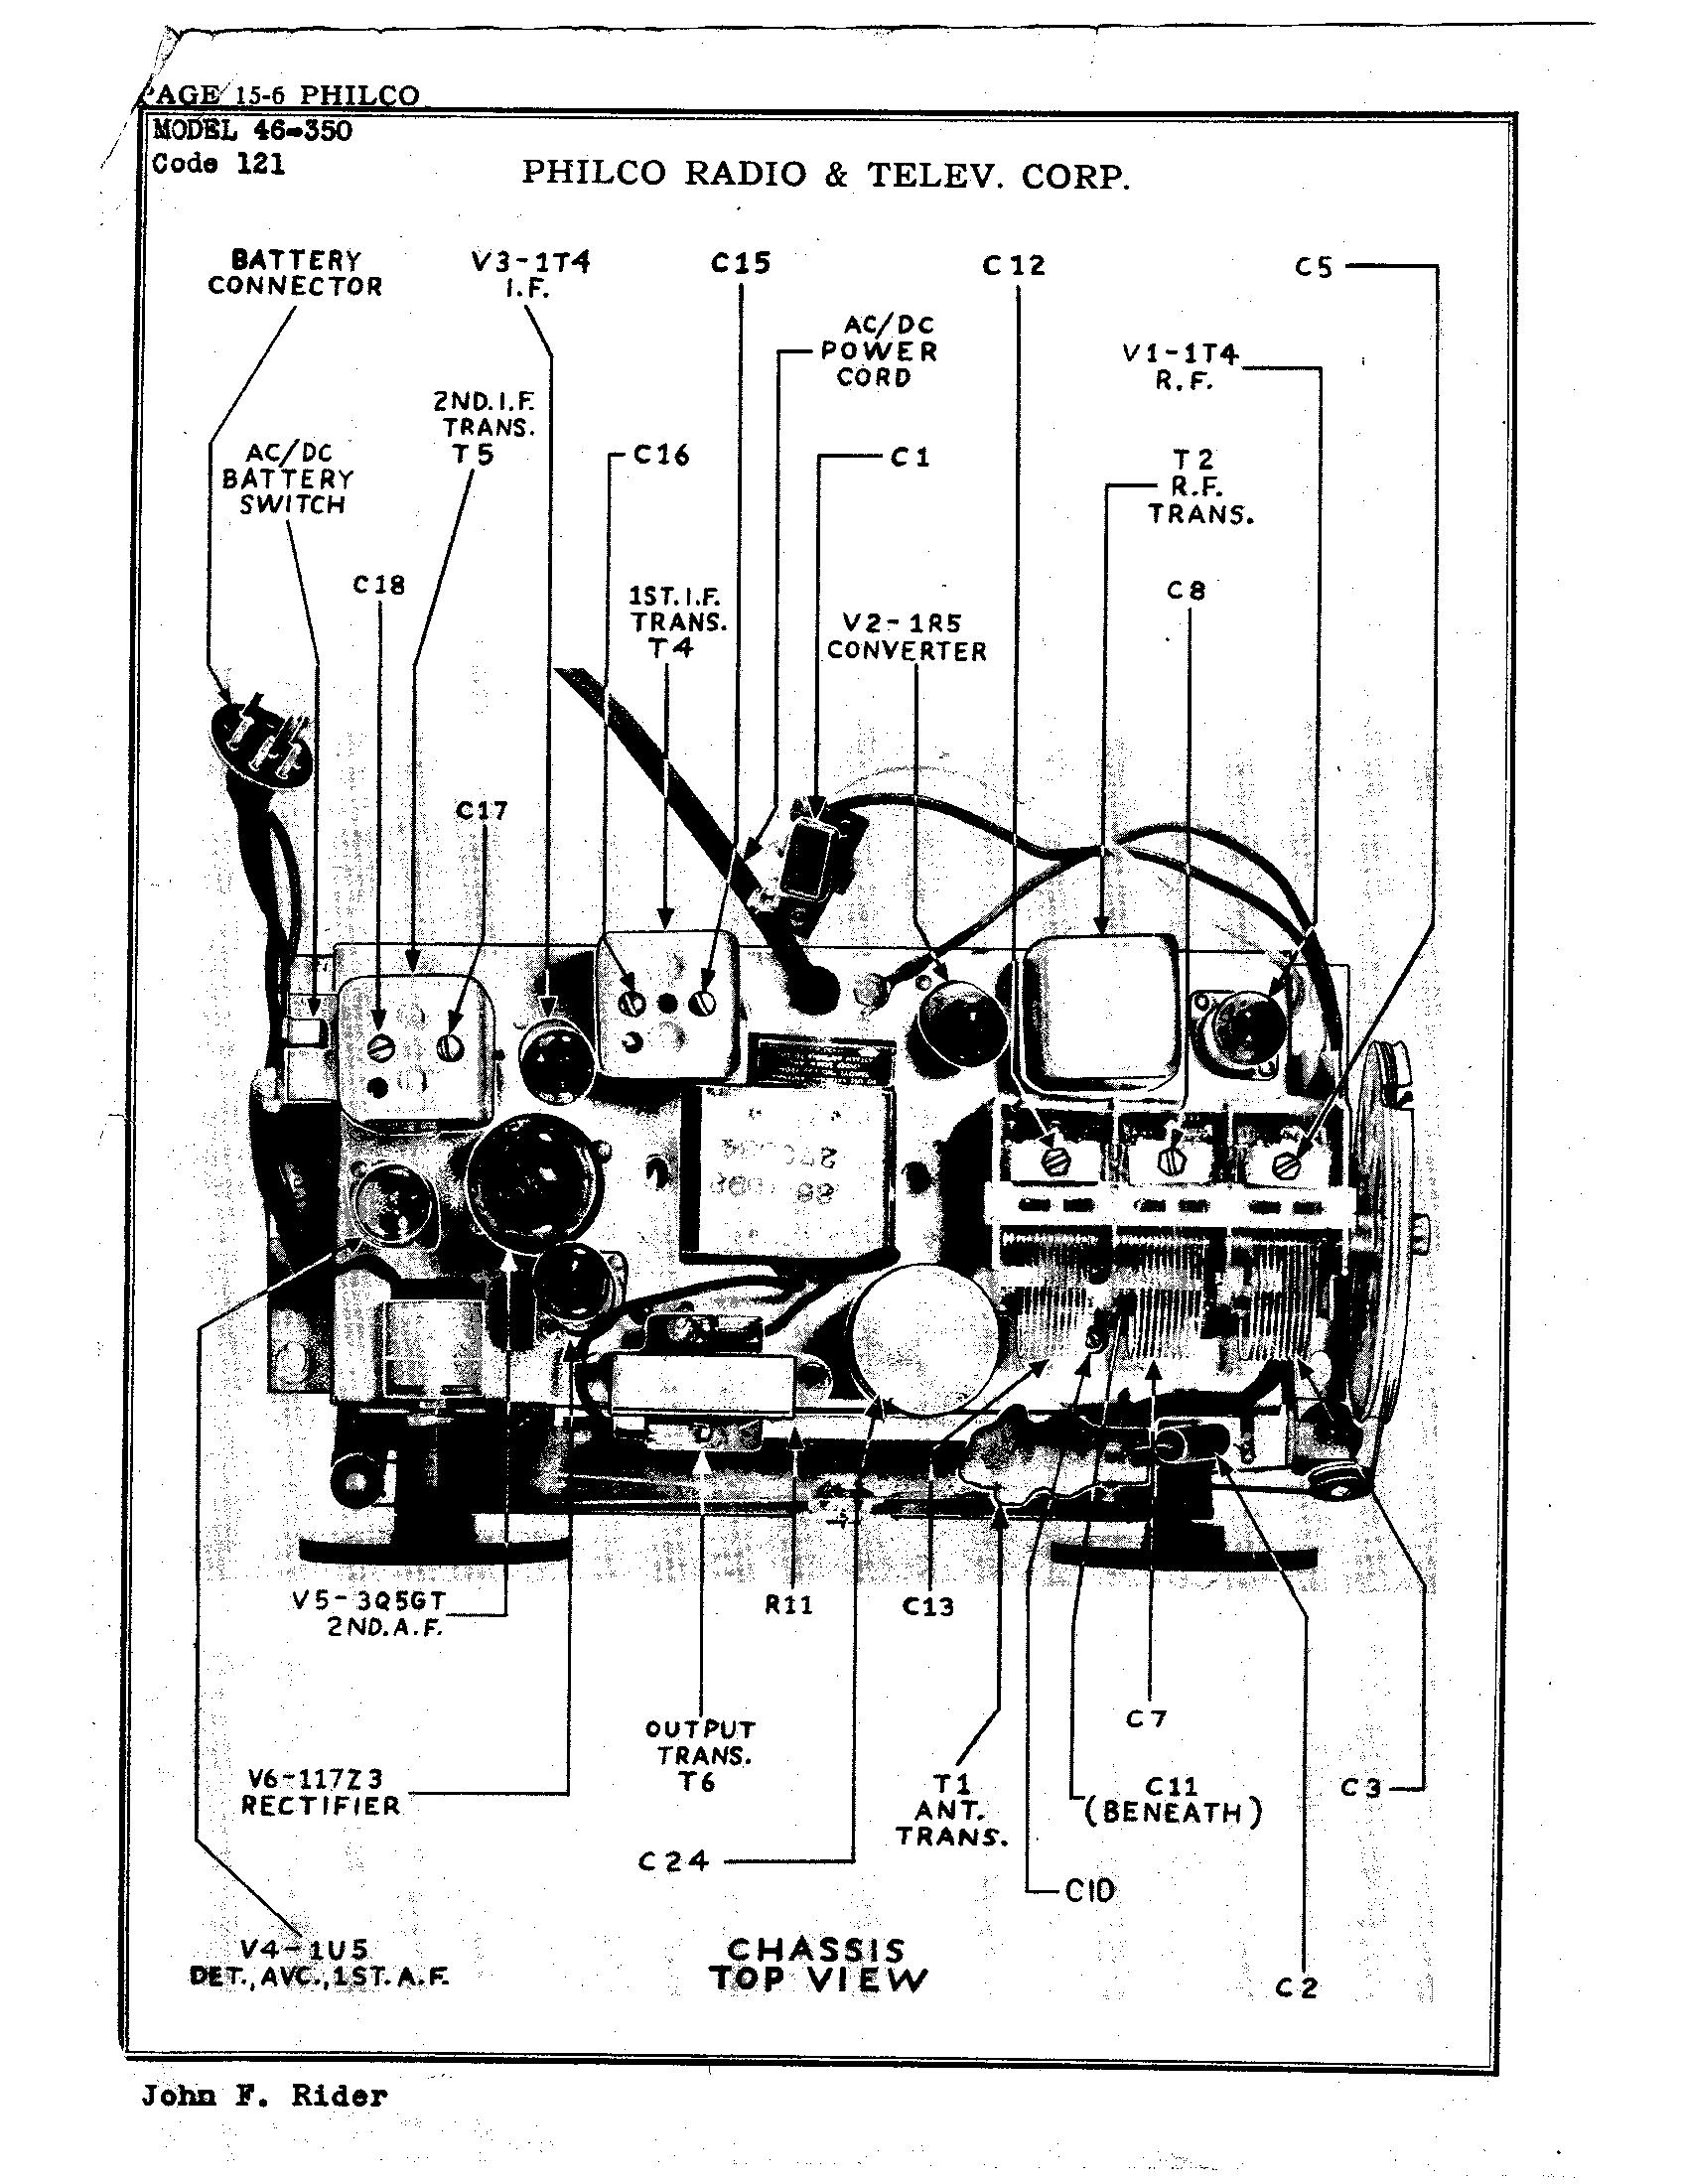 Philco Radio & Television Corp  46-350 (121) | Antique Electronic Supply